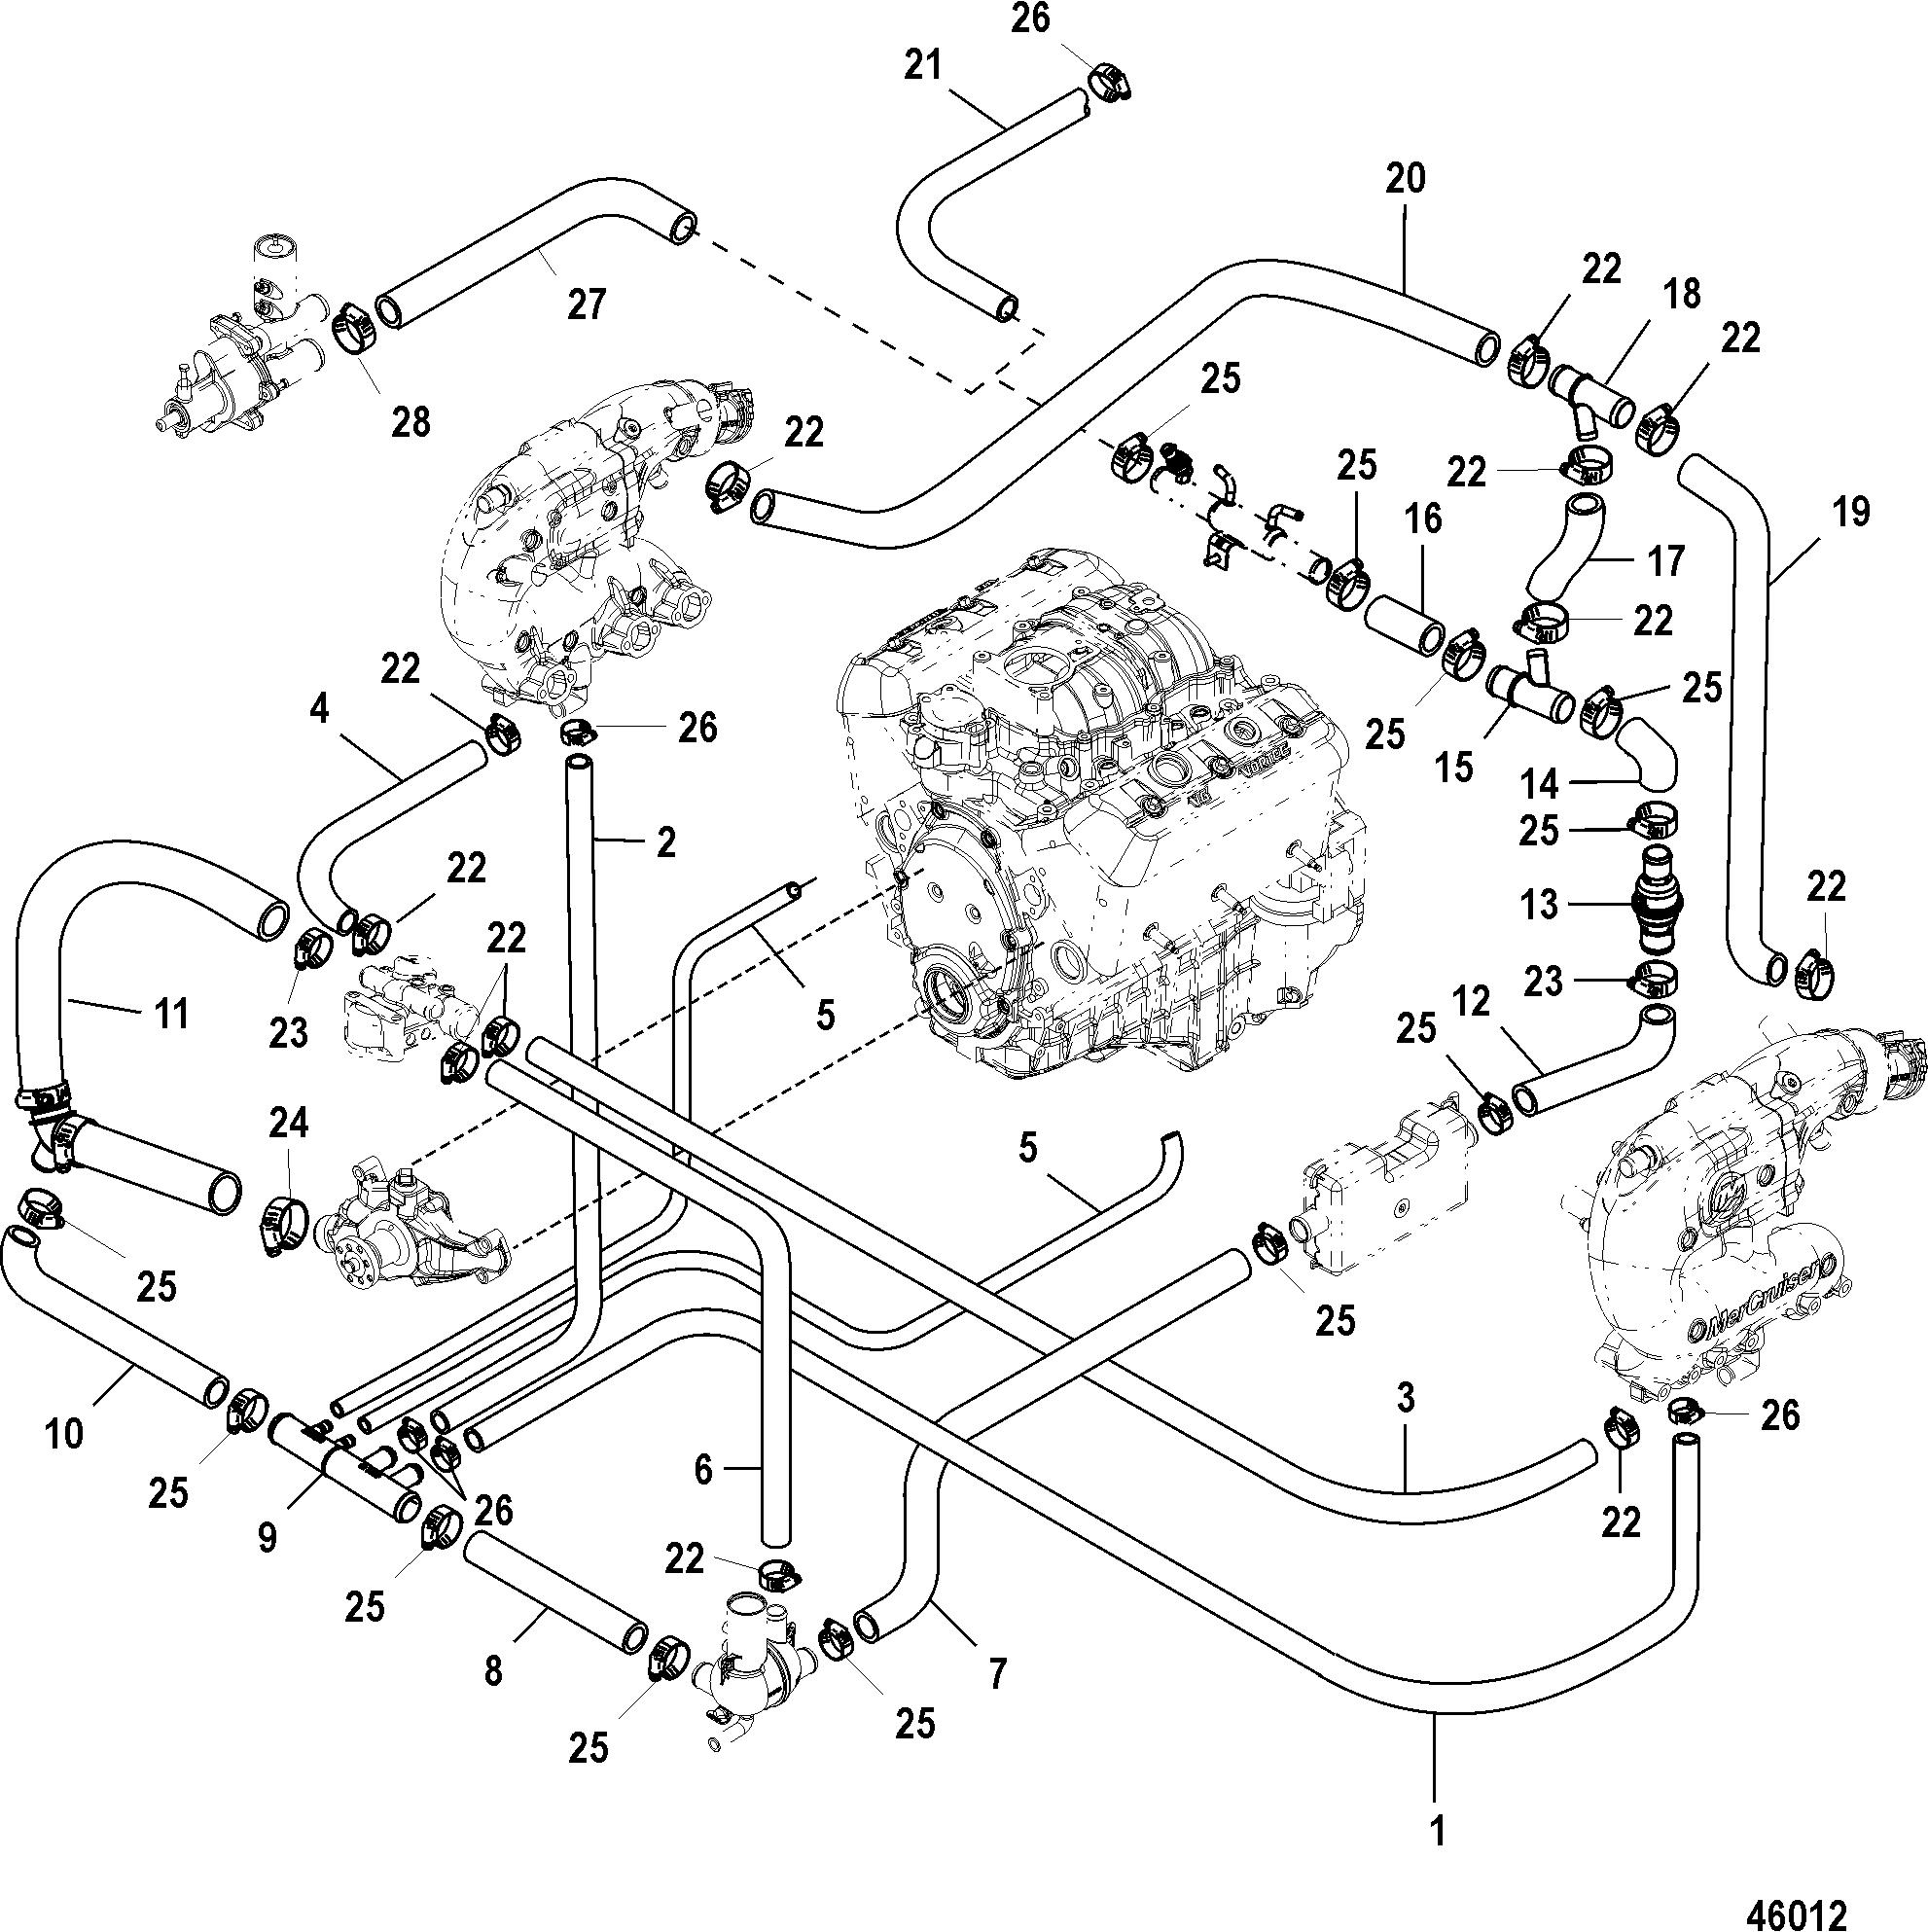 Standard Cooling, Alpha Single Pt With Handle / Bravo 3 Pt